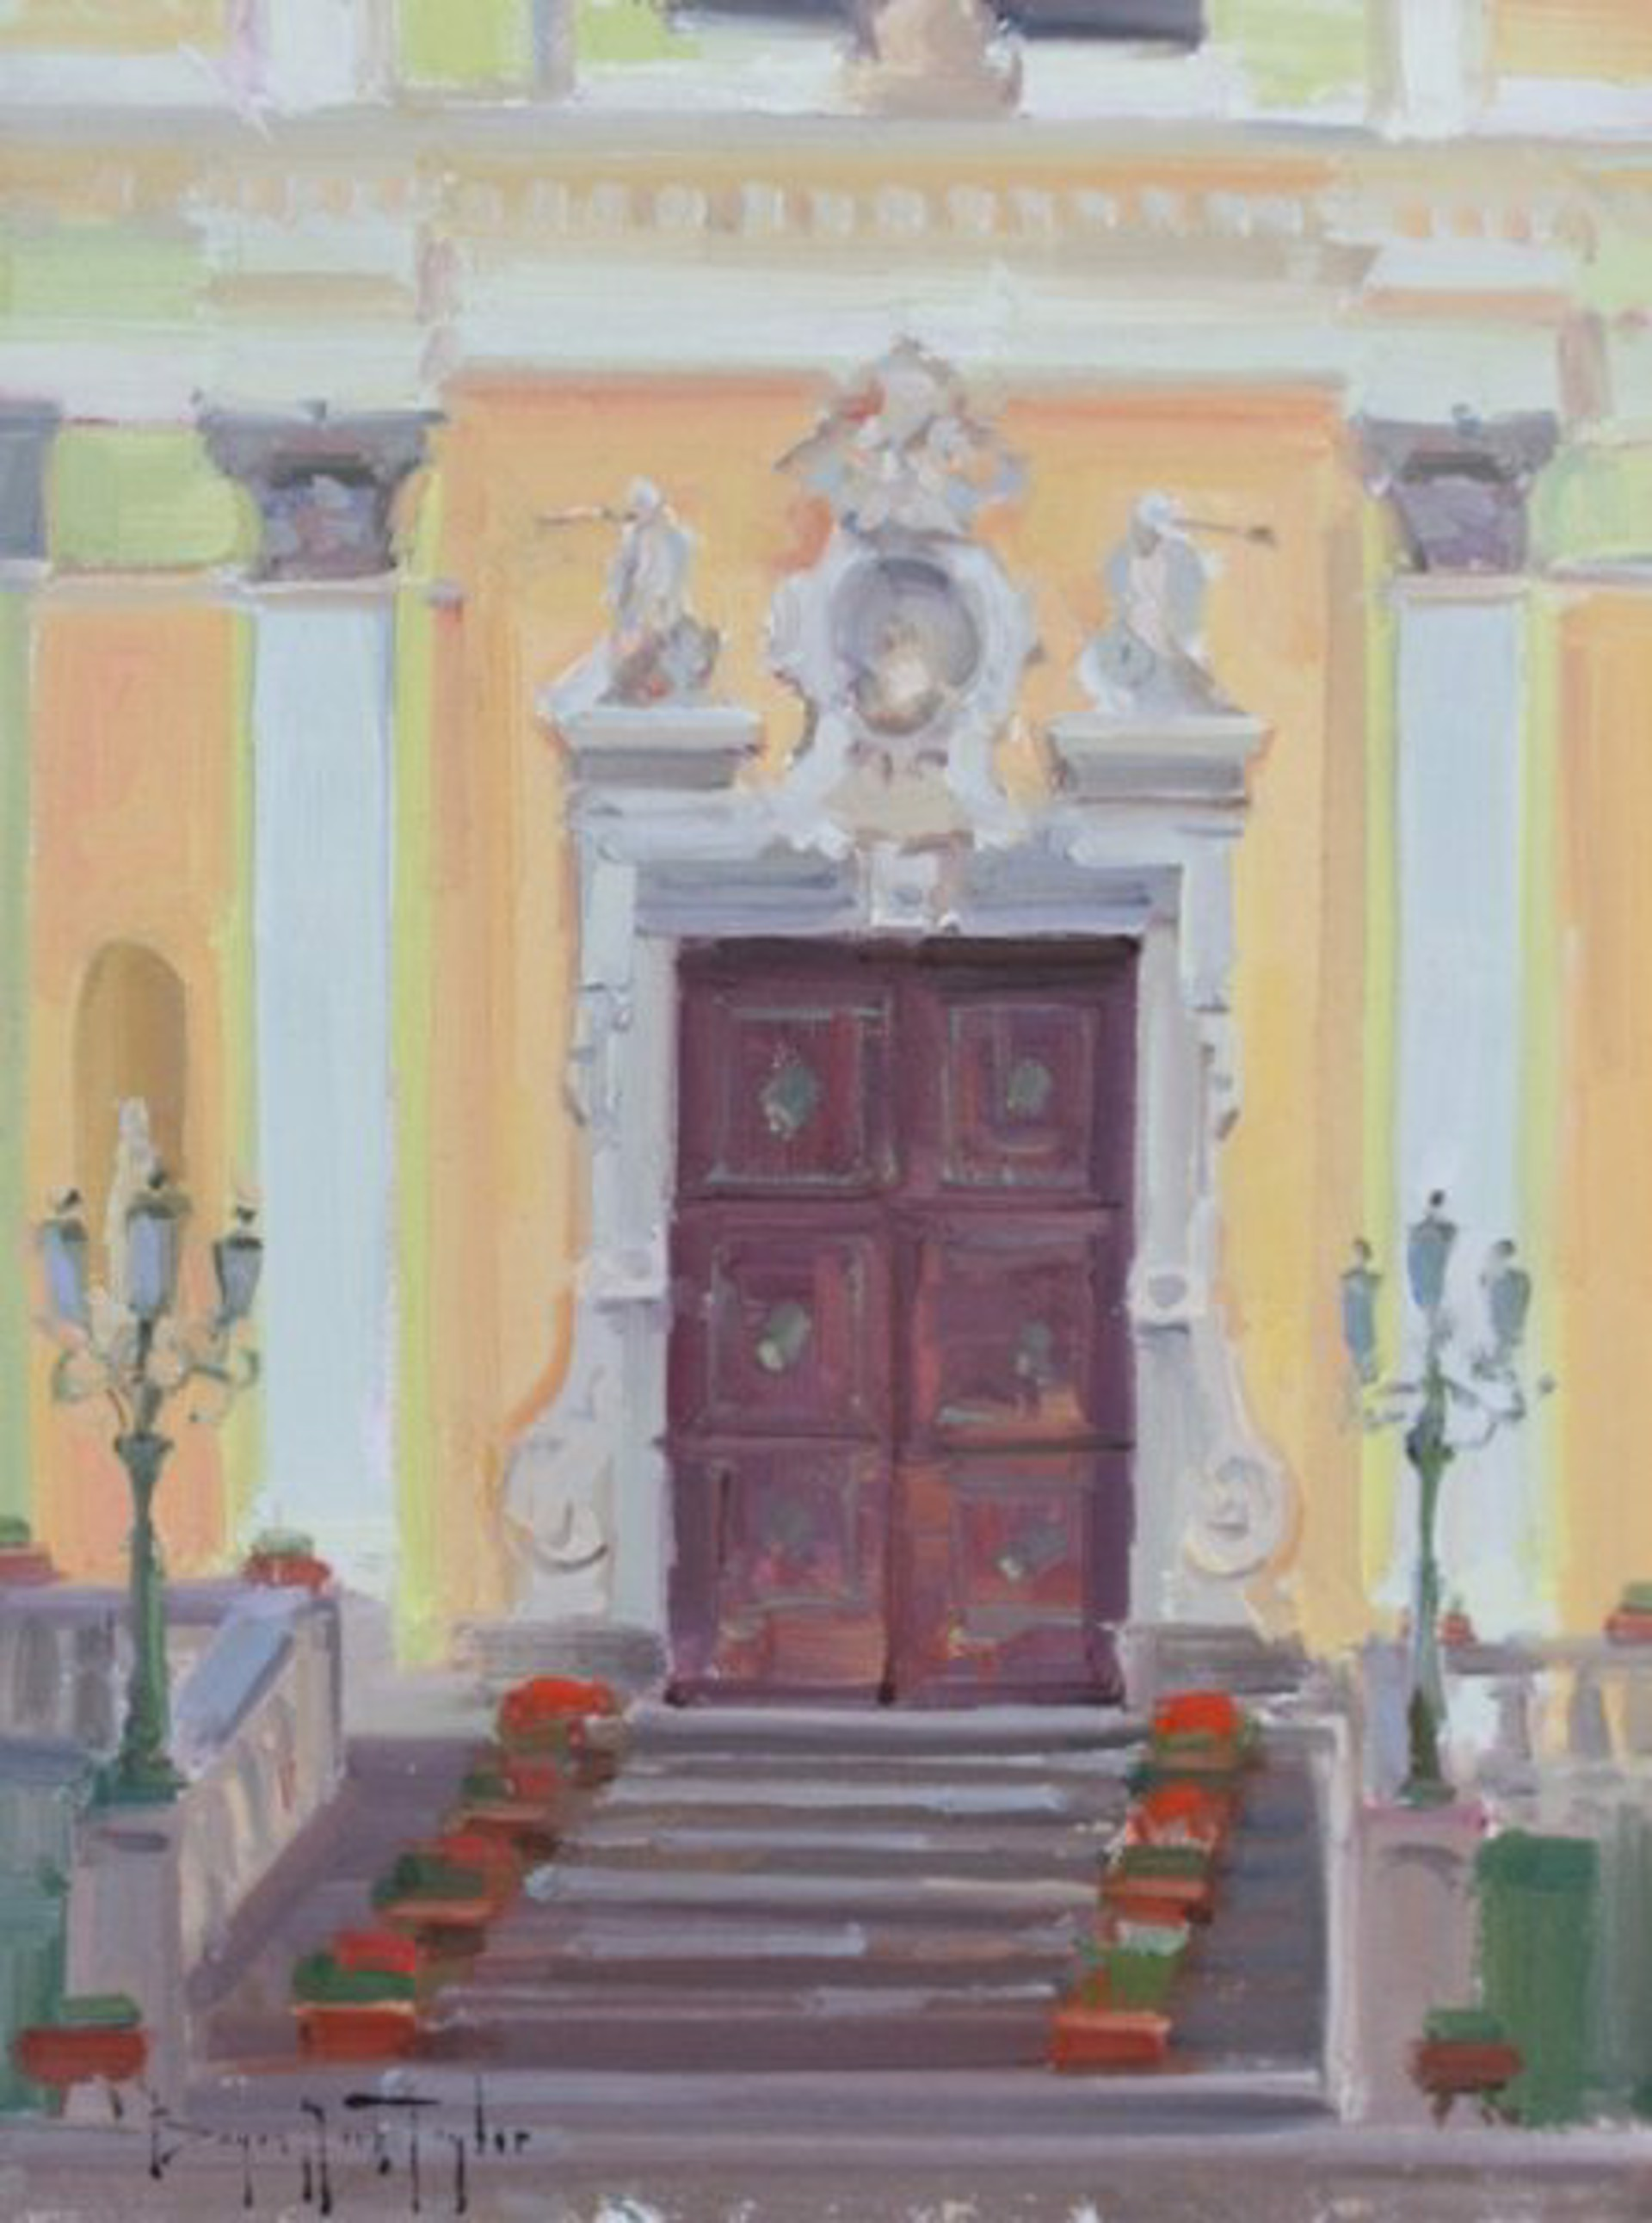 Minori Church Doors by Bryan Mark Taylor